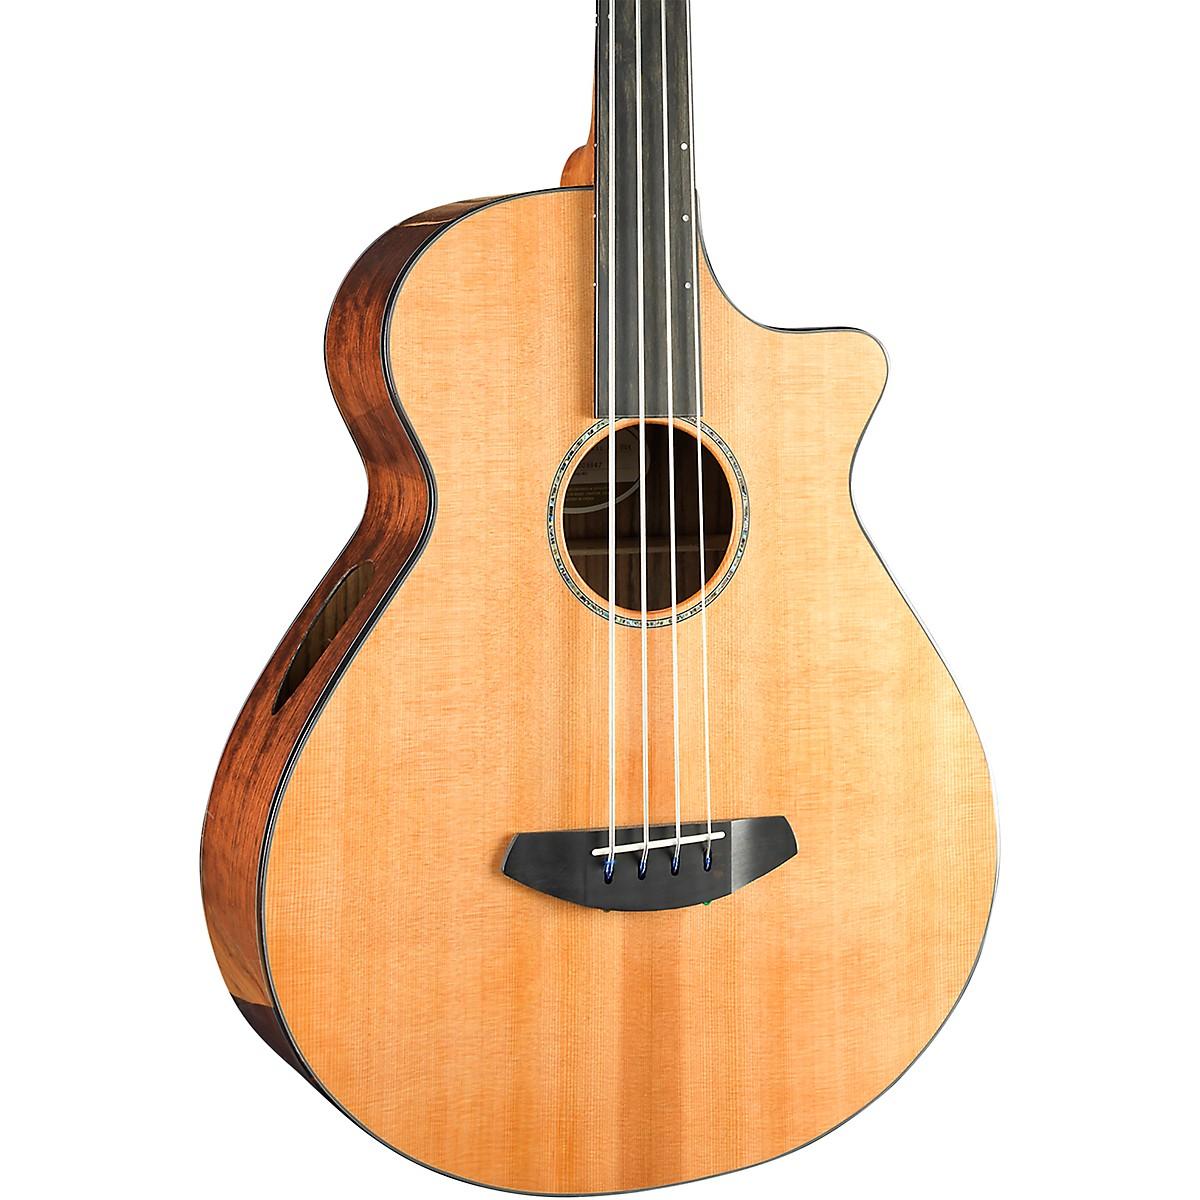 Breedlove Solo Jumbo Fretless Cutaway CE Acoustic-Electric Bass Guitar